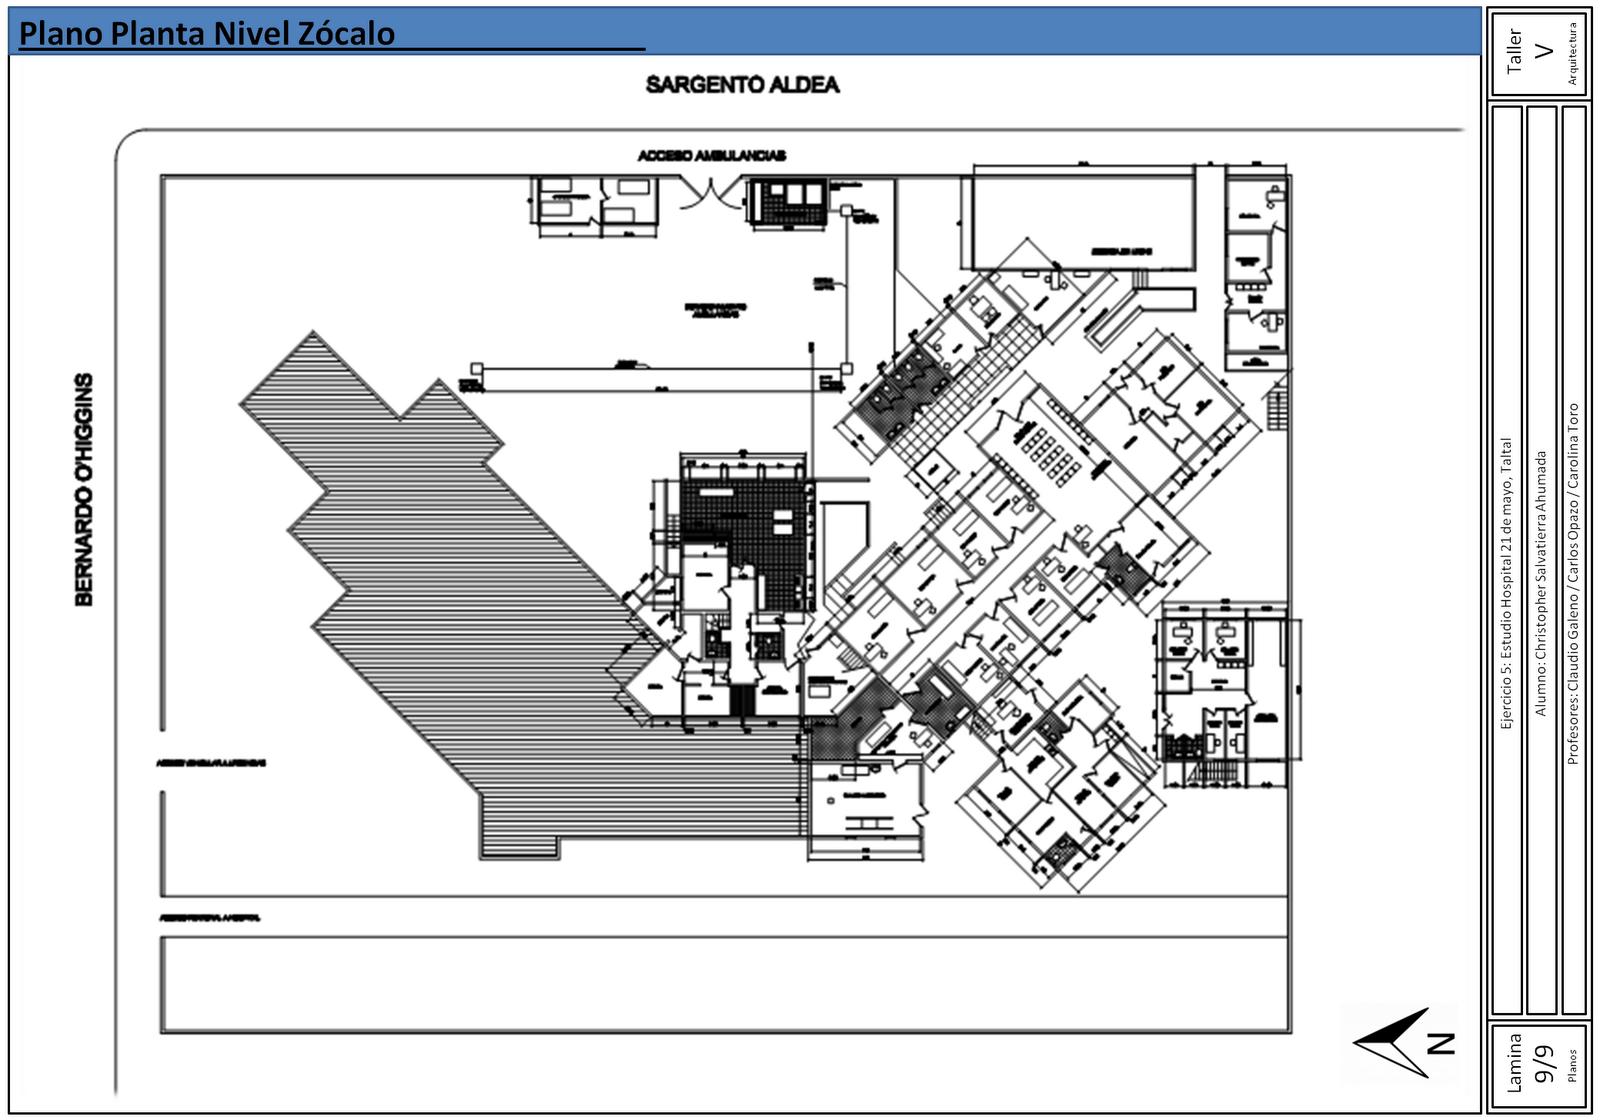 Taller de arquitectura 5 lenguaje 1er semestre de 2012 for Arquitectura 5 de mayo plan de estudios